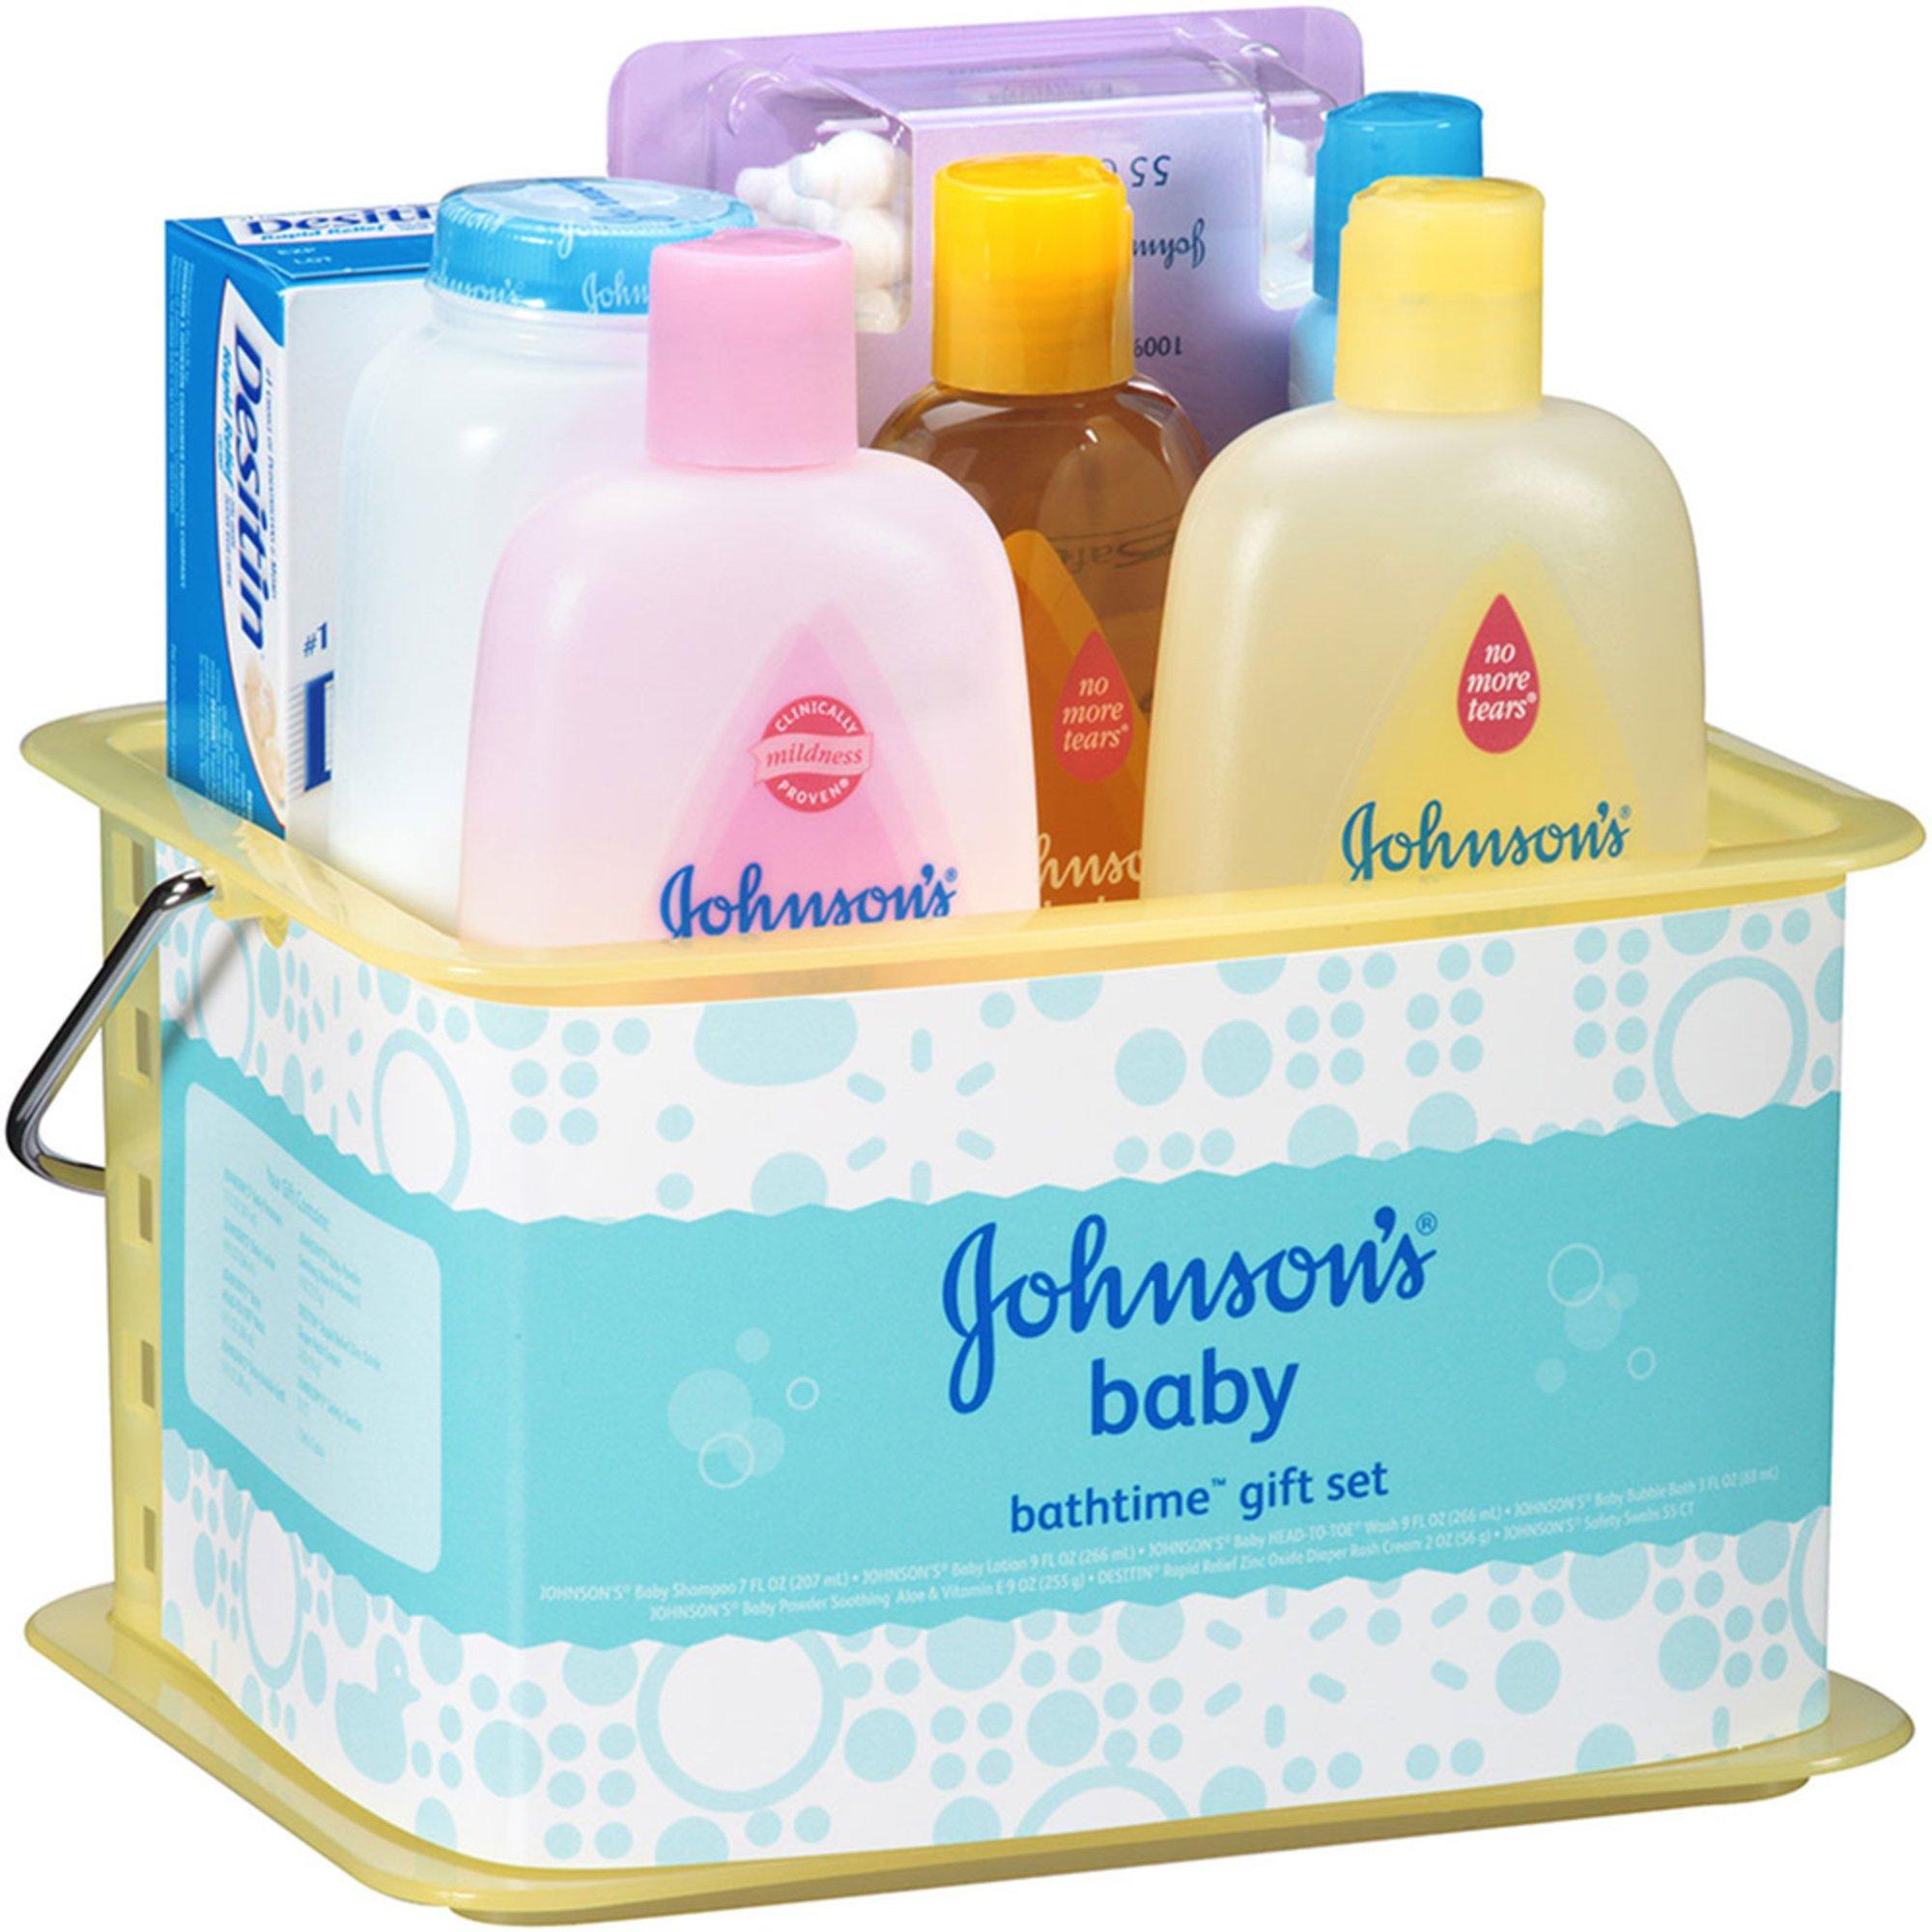 Baby Gift Sets : Johnson s baby bathtime gift set sets